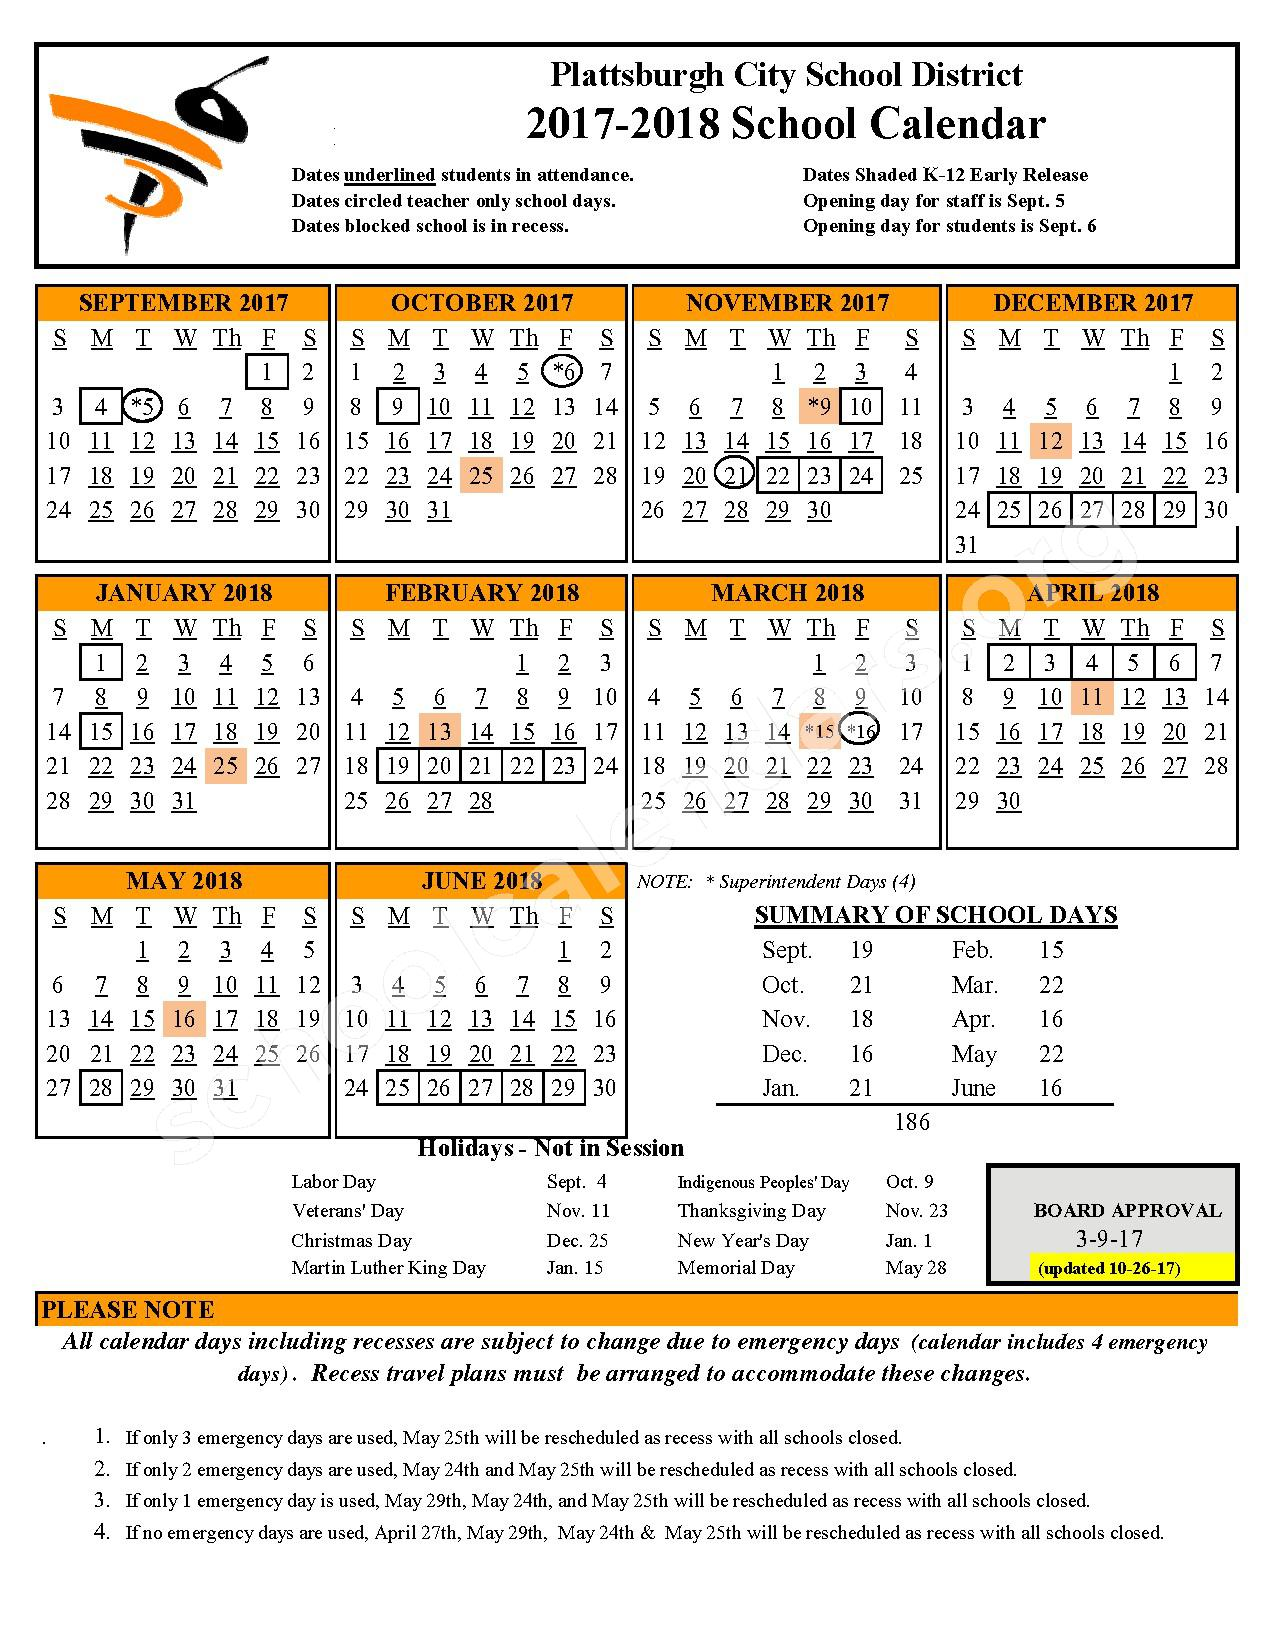 2017 - 2018 District Calendar – Plattsburgh City School District – page 1